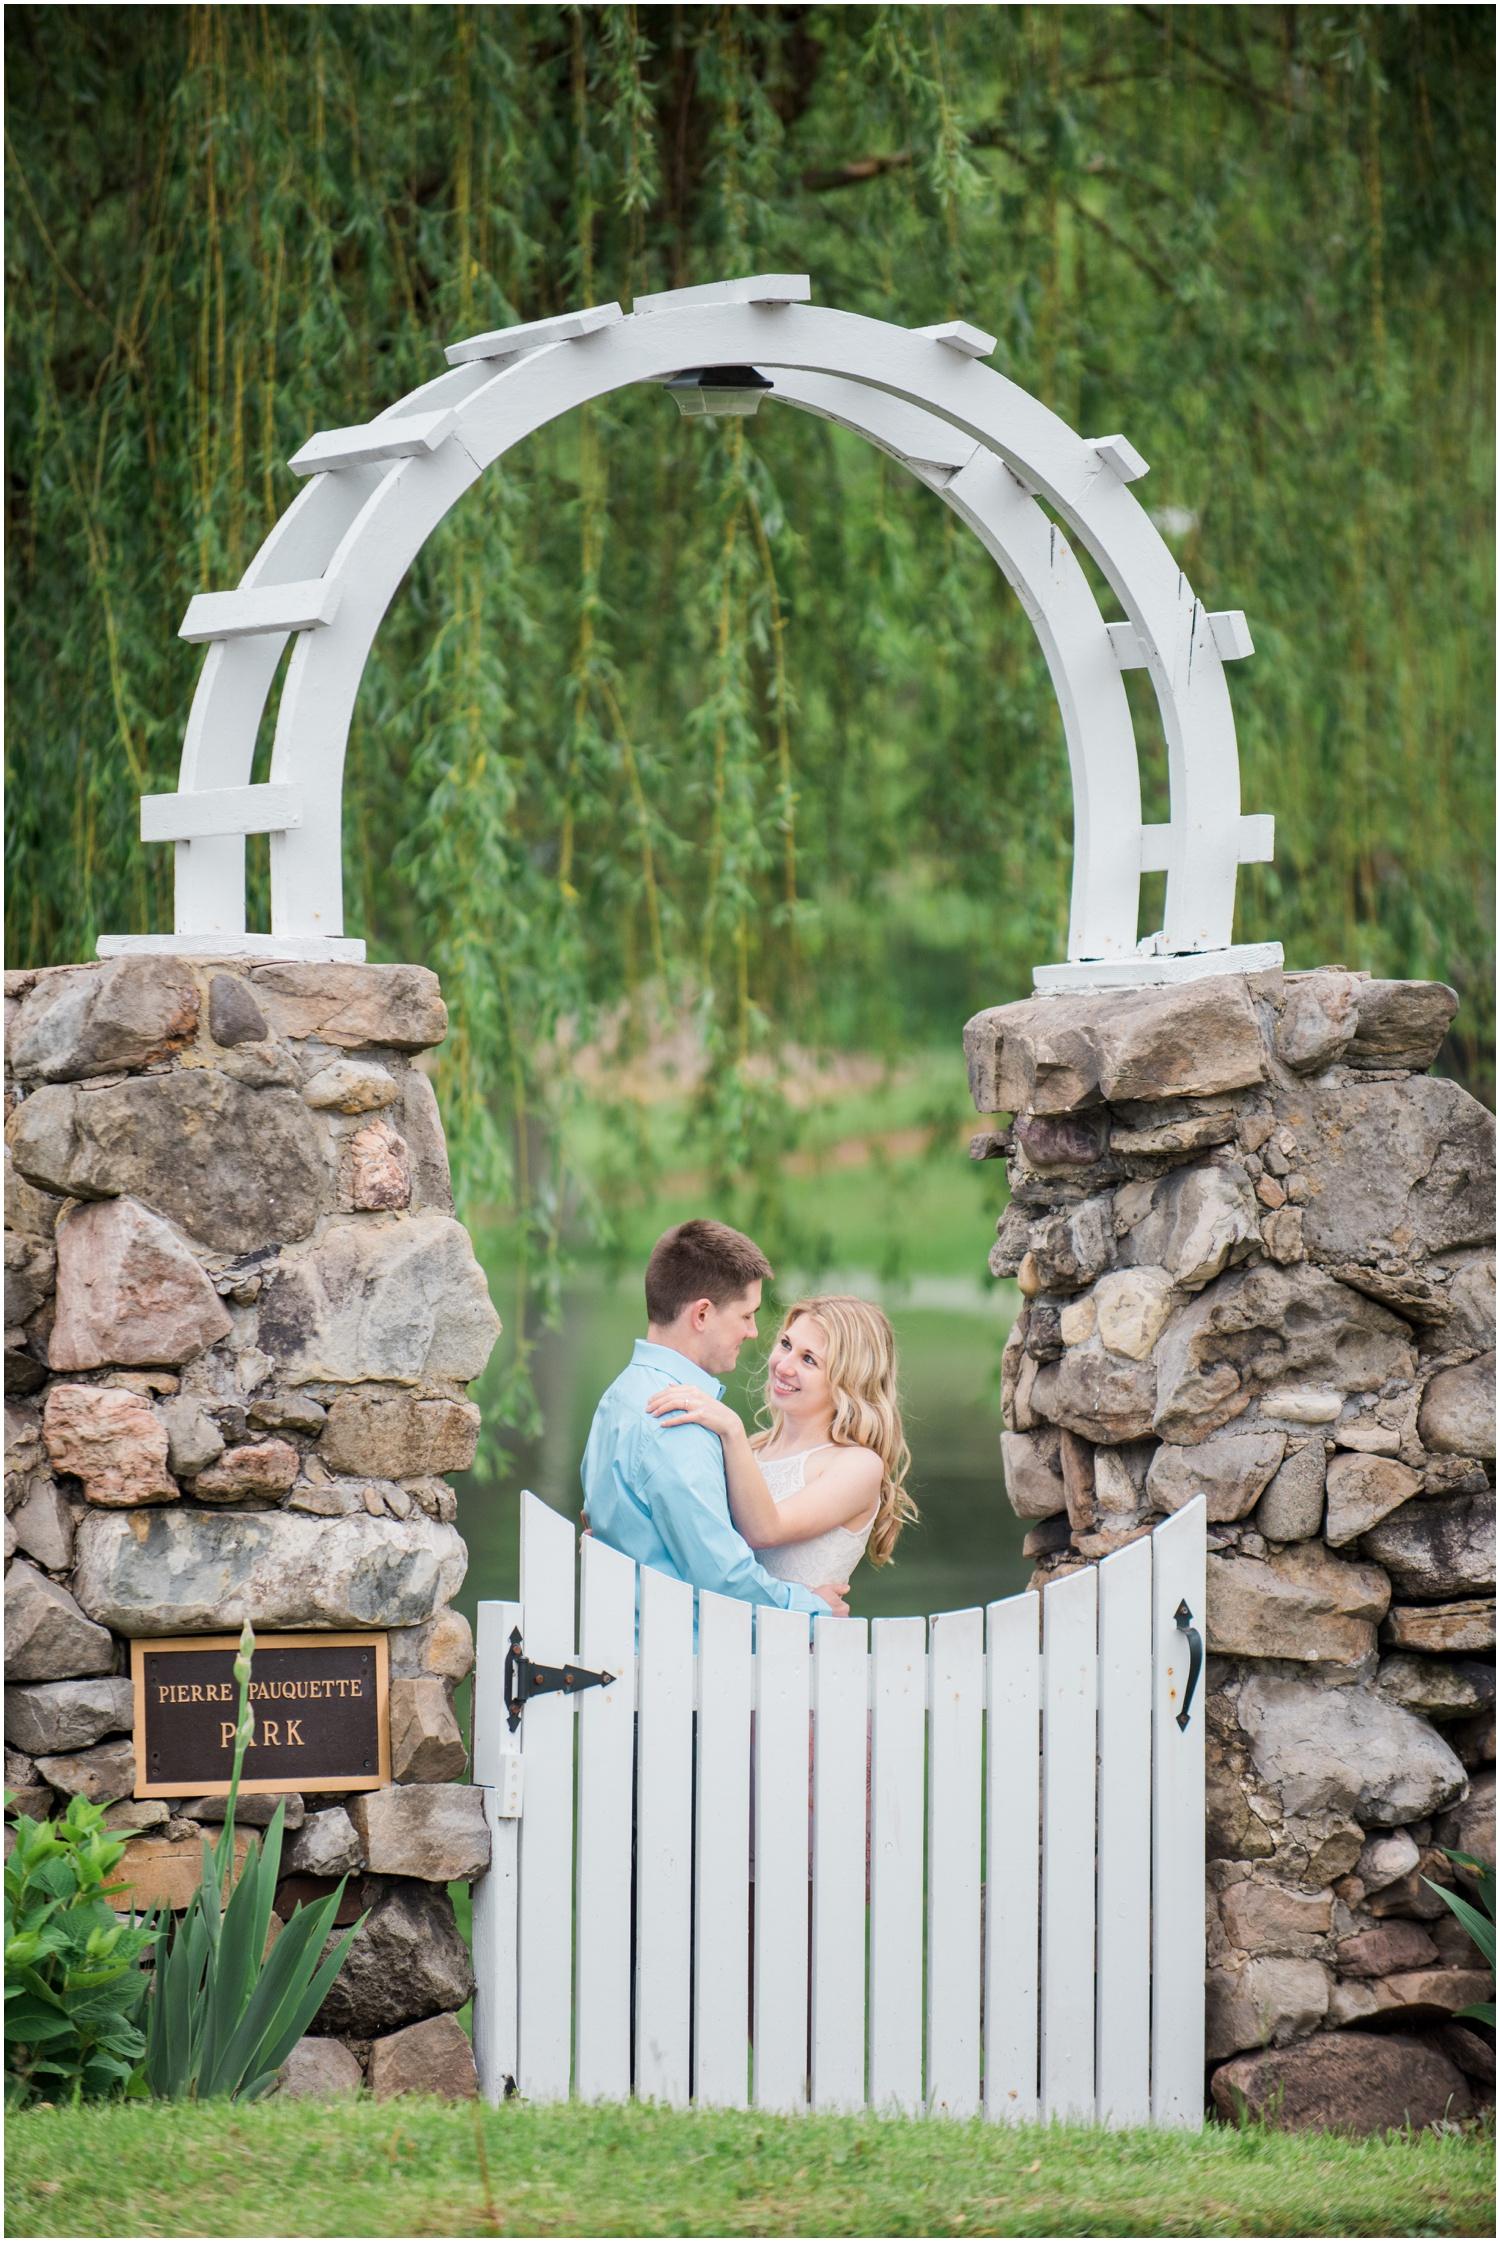 Paquette_Park_Portage_WI_Engagement_Photos_Heather_and_Derek_0020.jpg